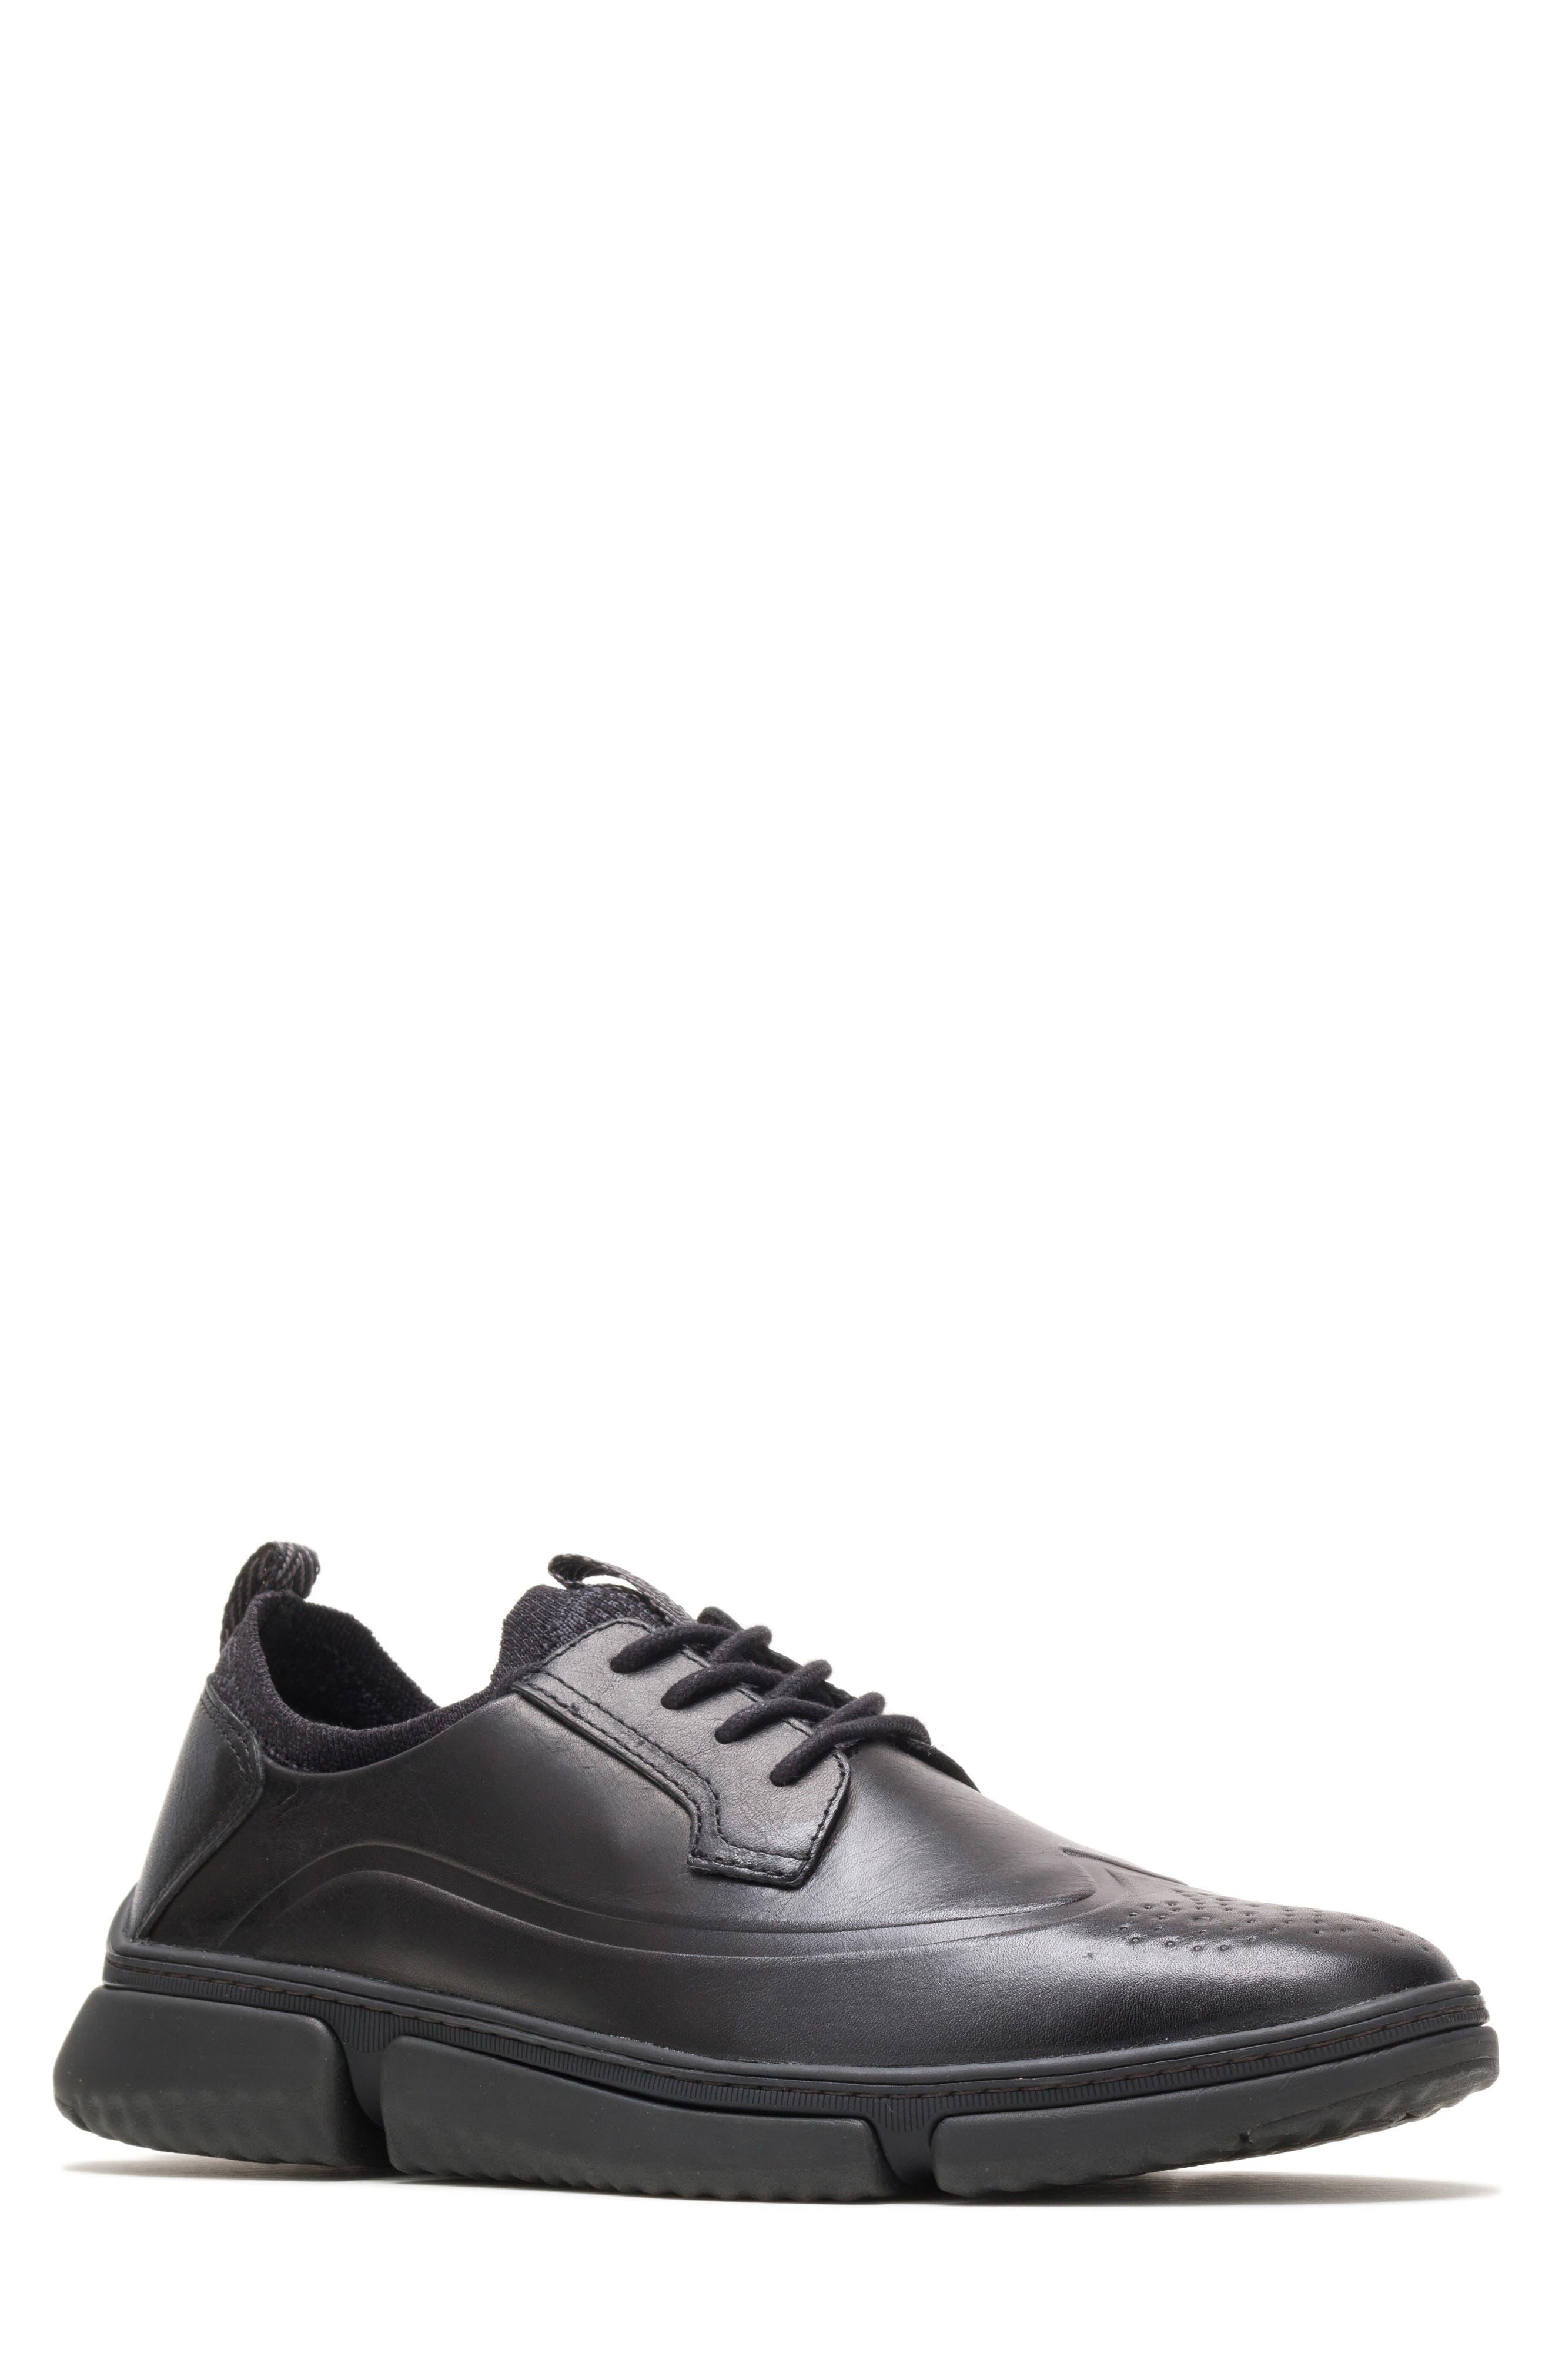 Bennet Wingtip Sneaker